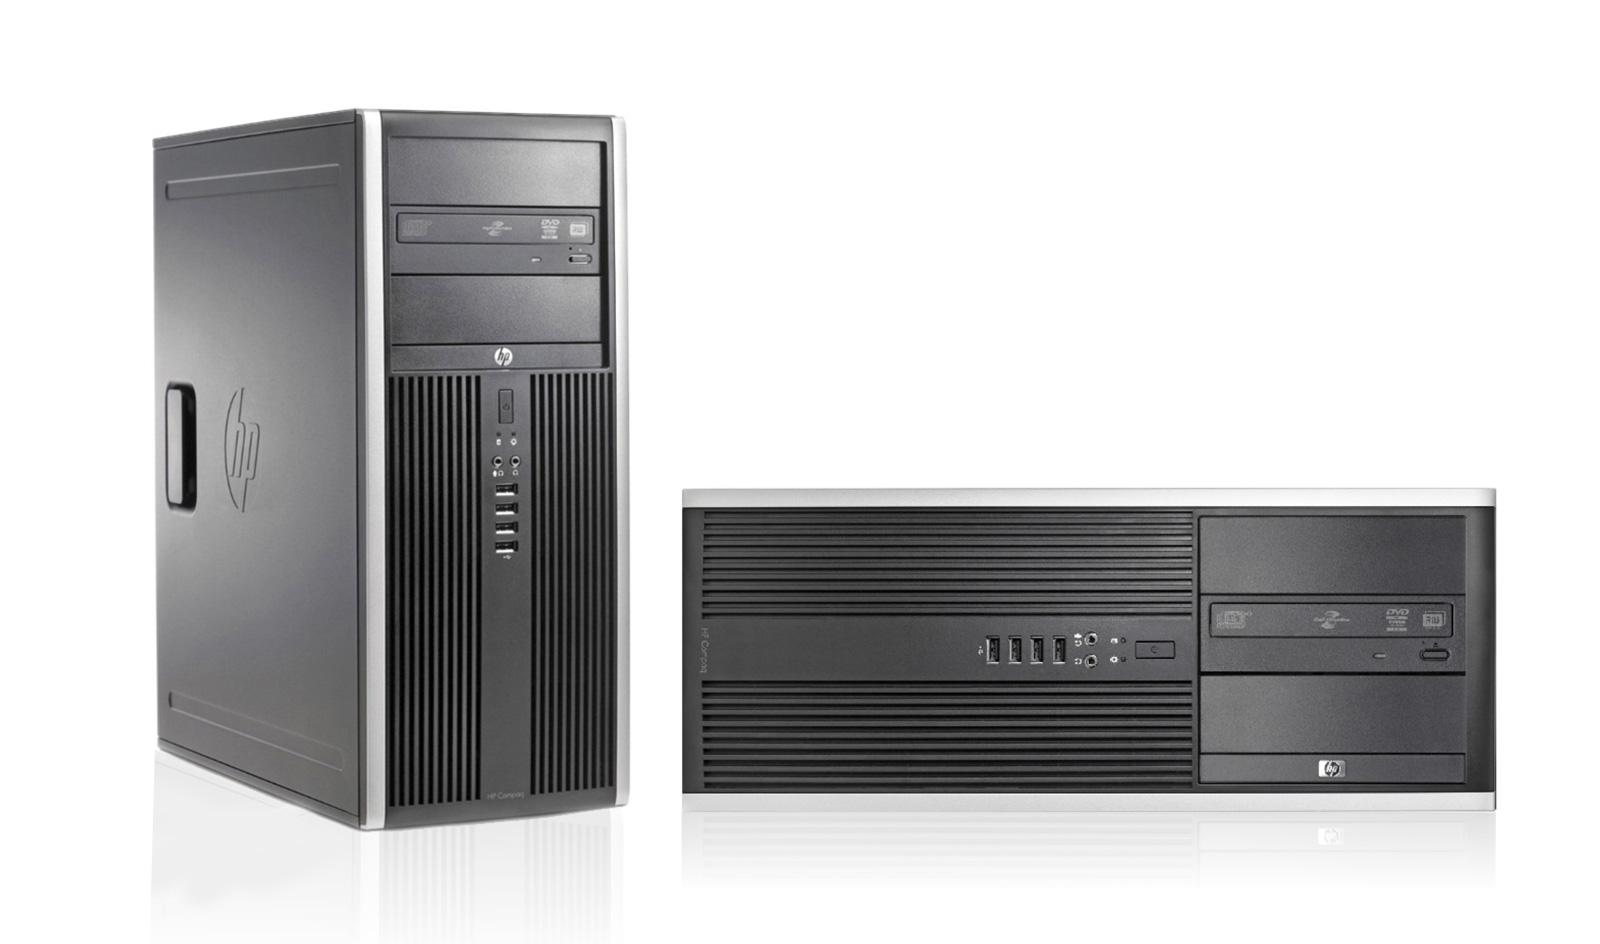 HP PC 8300 CMT, i5-3470, 4GB, 250GB HDD, DVD, REF SQR - HP 28787